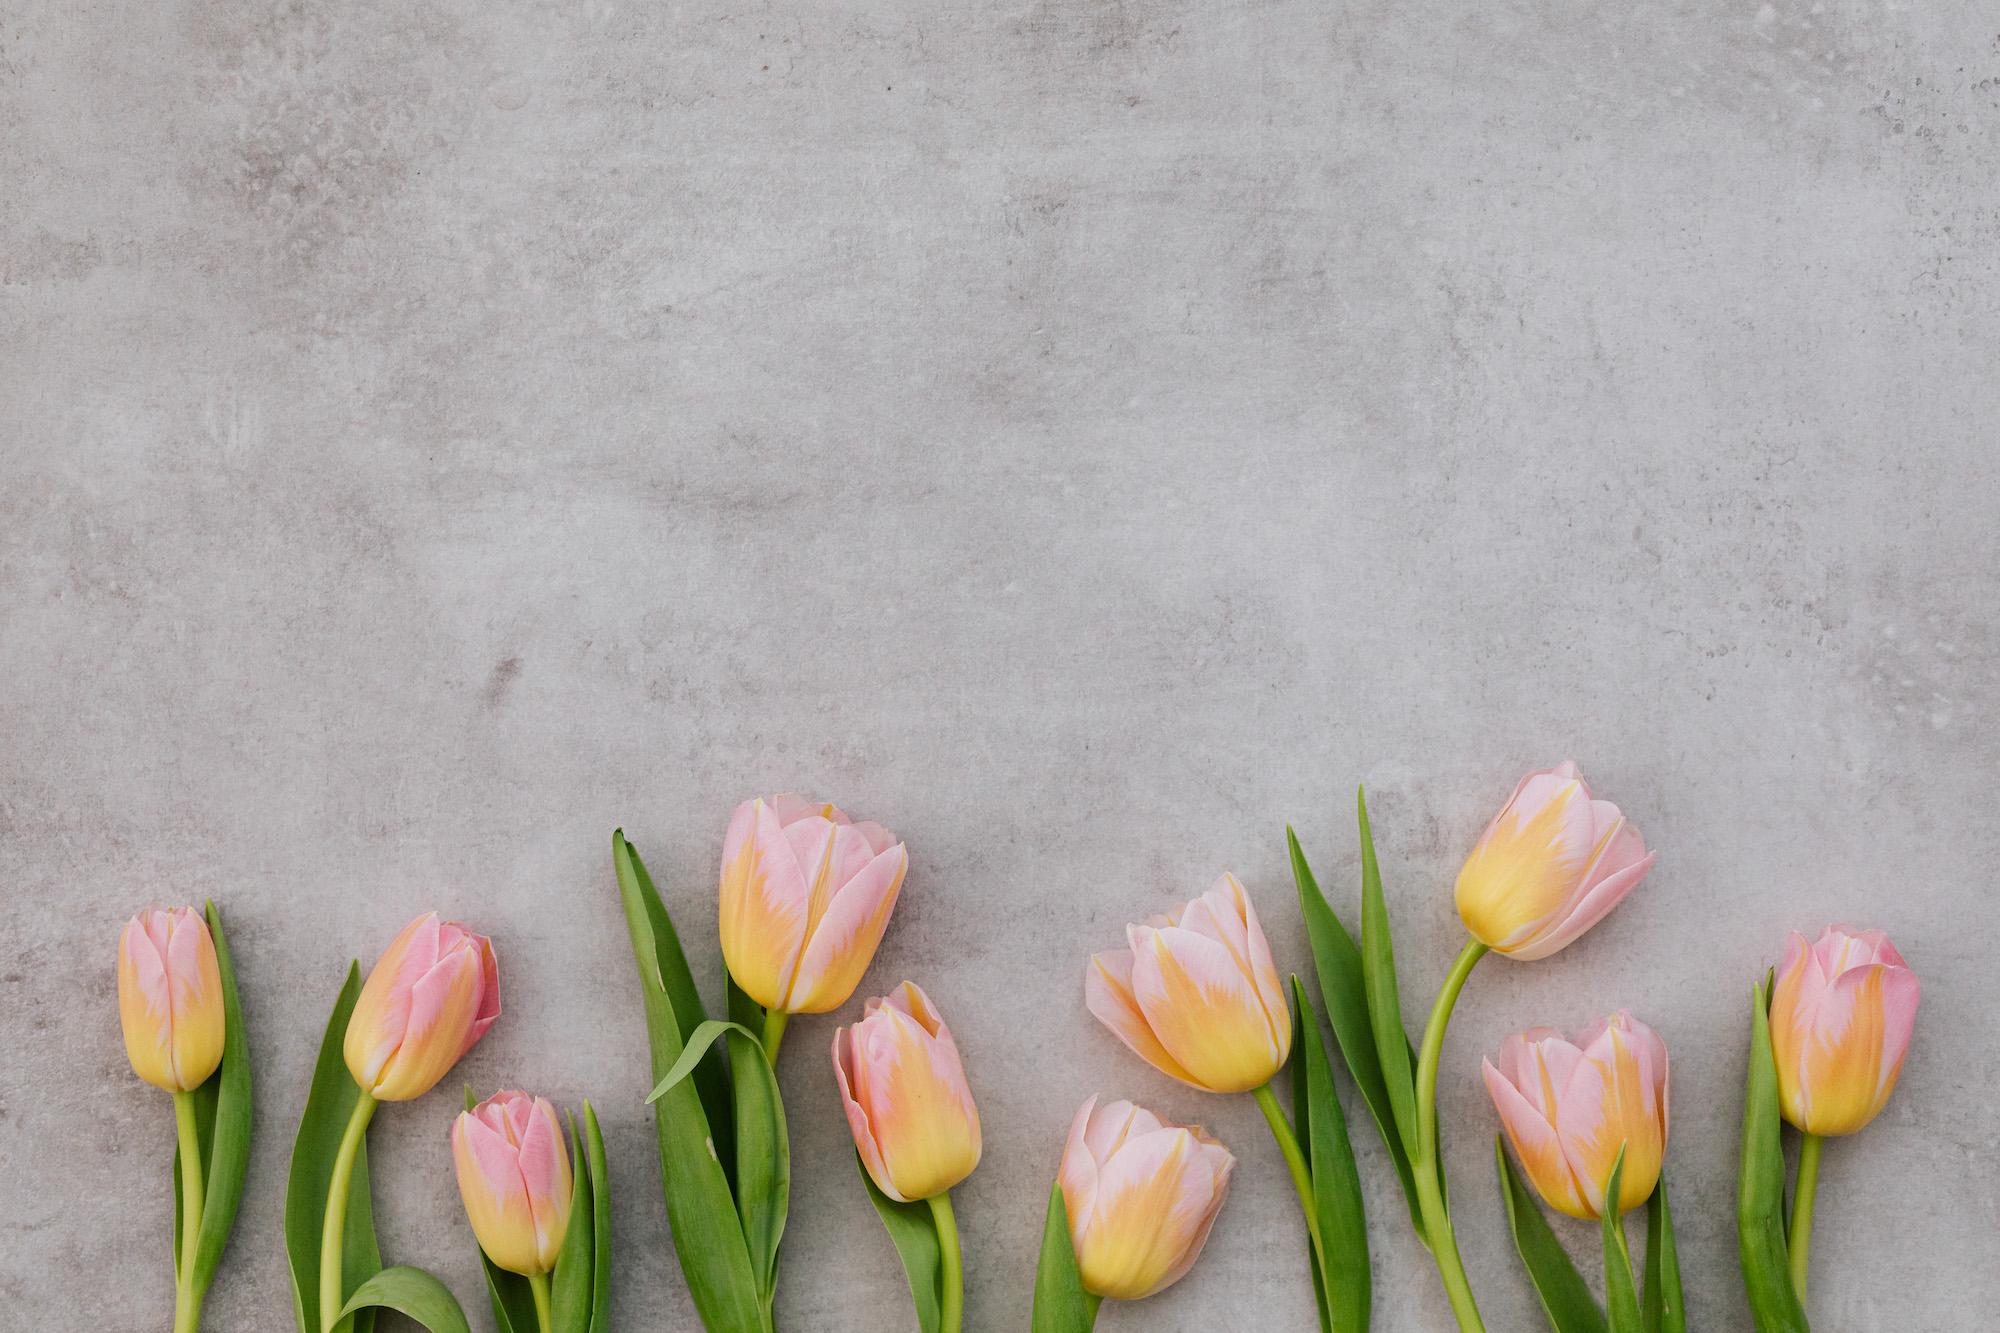 kaboompics_Pink and yellow tulips-5r